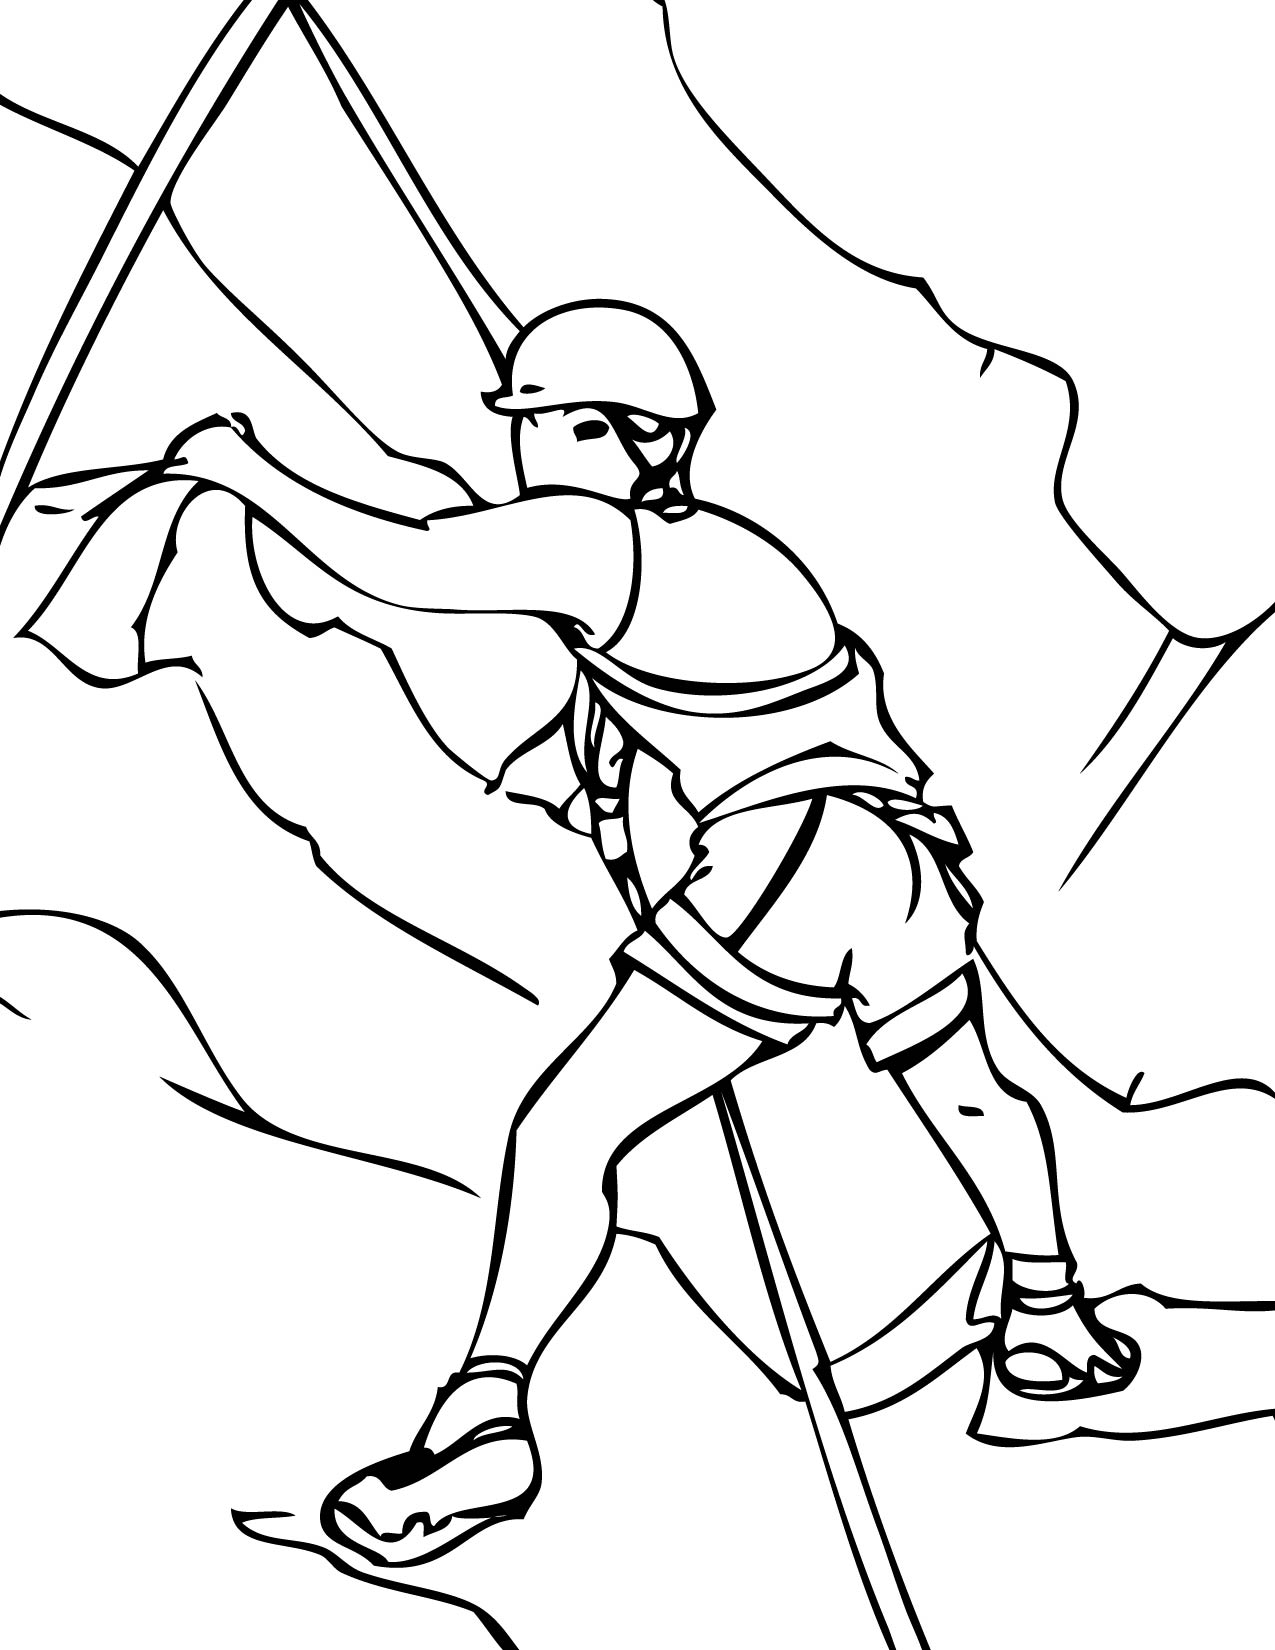 Climbing coloring #18, Download drawings